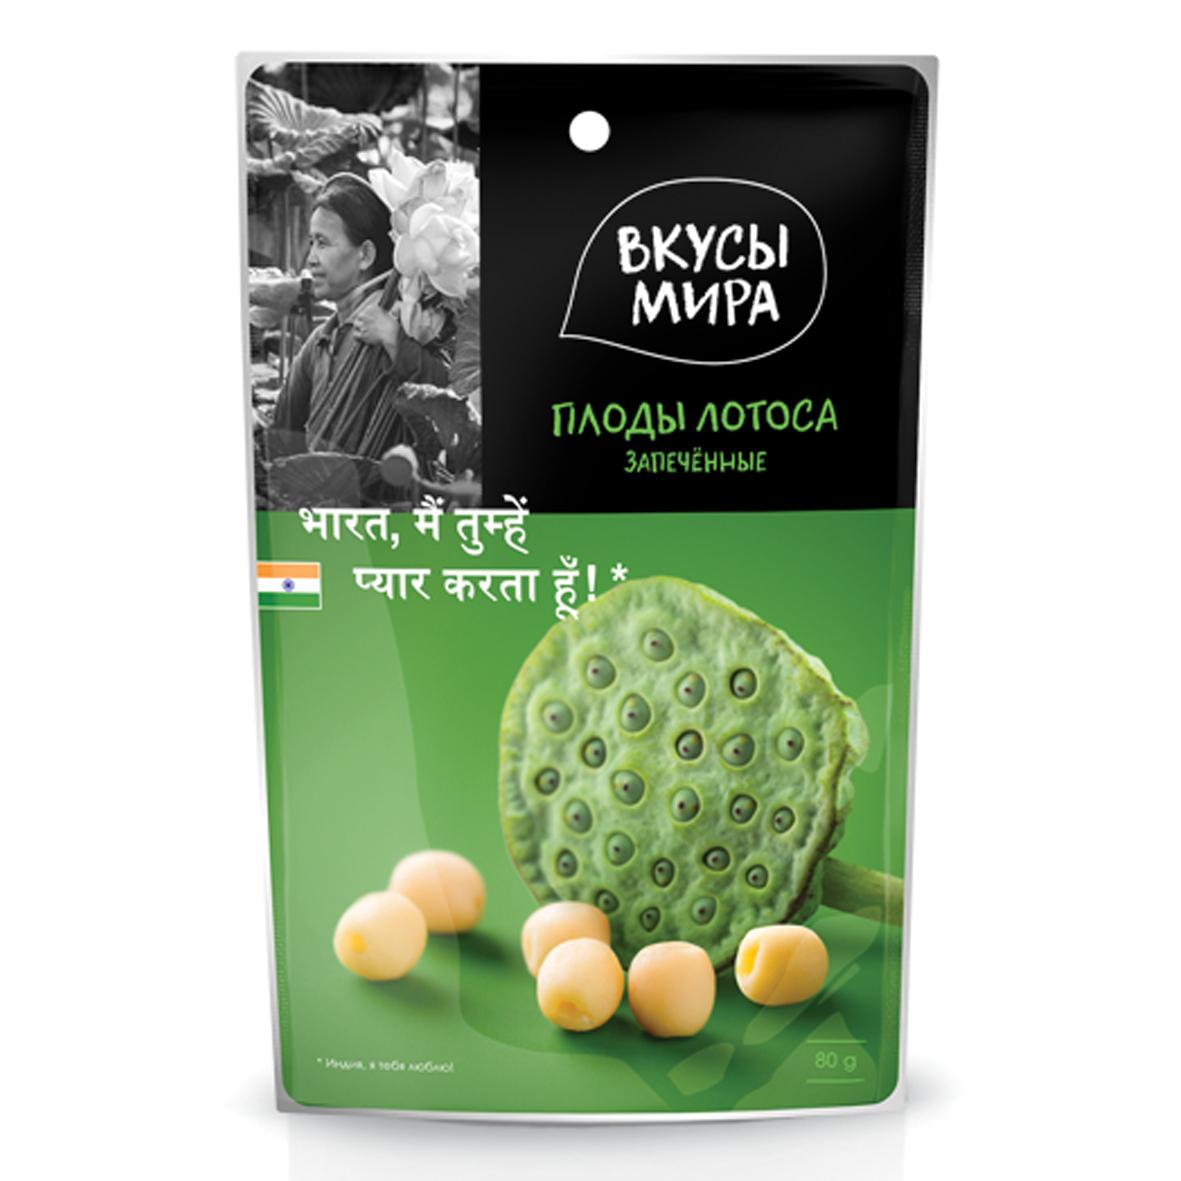 Плоды лотоса запеченные 80 гр